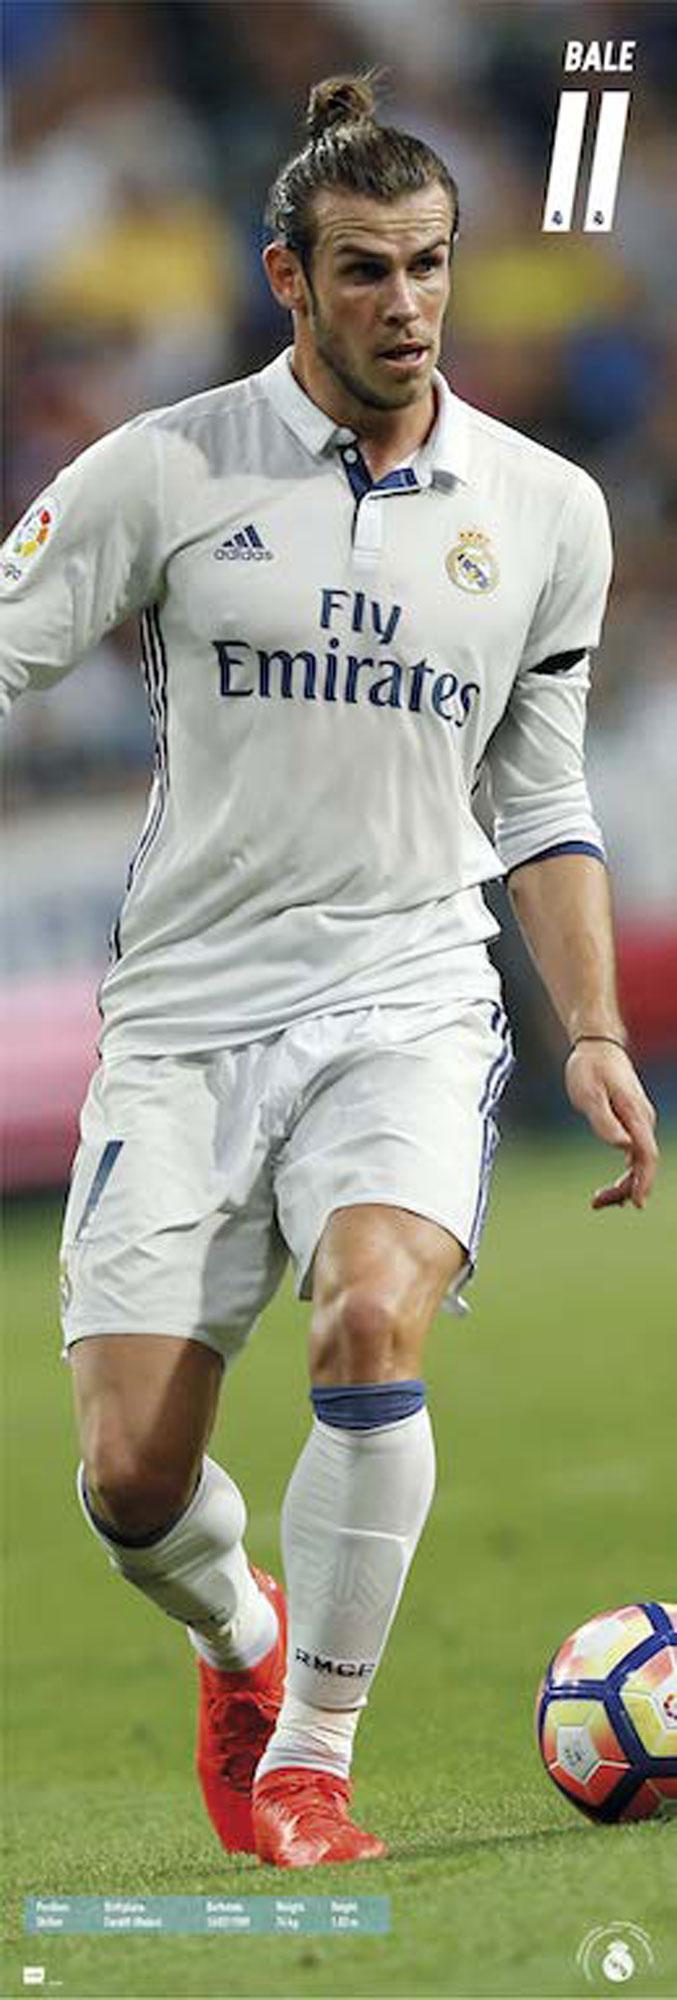 Bale Fußball